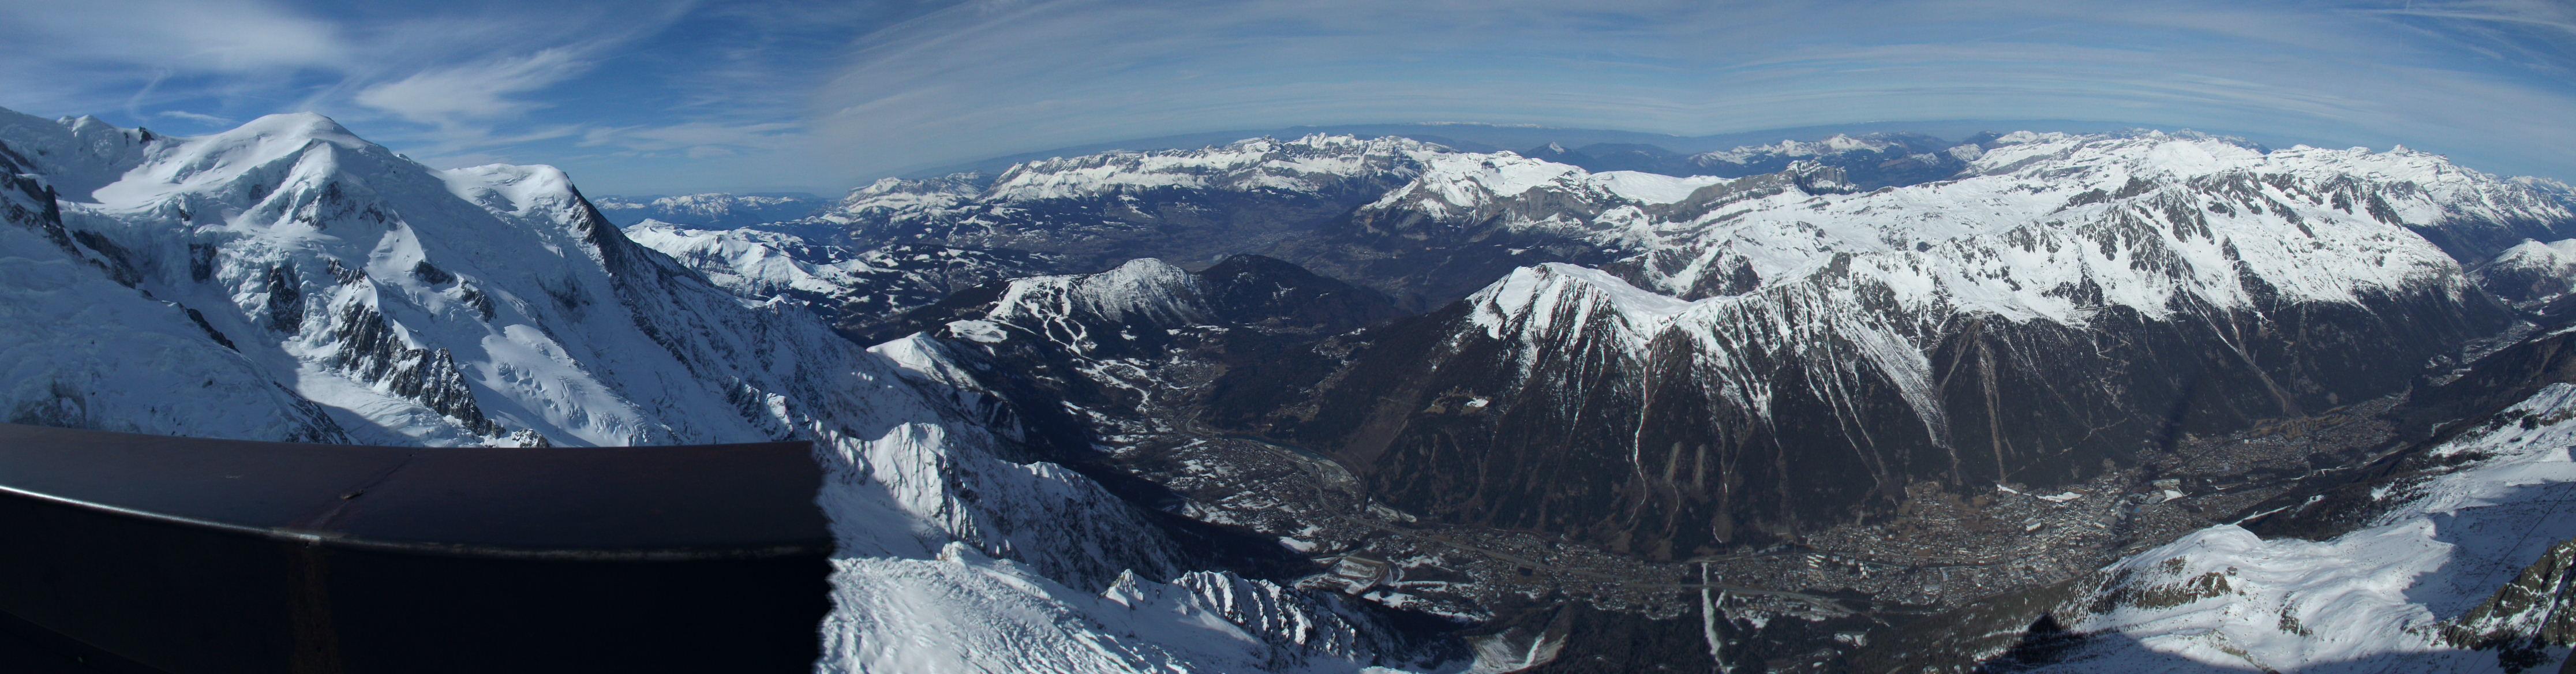 Chamonix panorama Aiguille du Midi